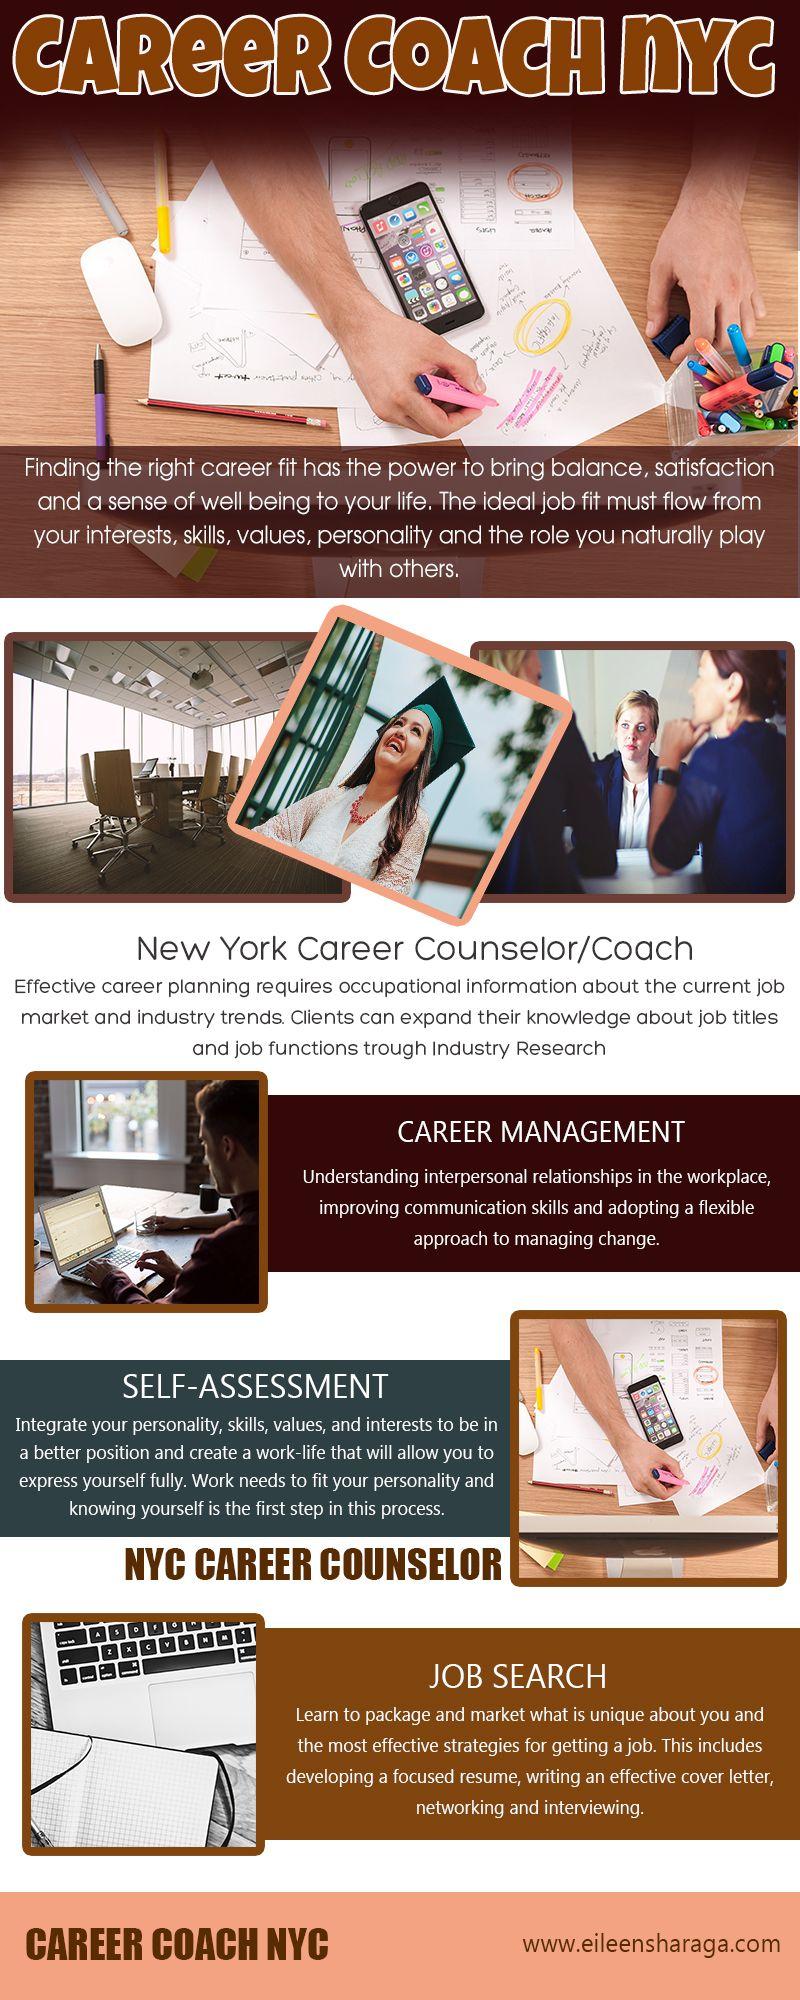 Our Website httpseileensharagacom A Career Counselor NYC